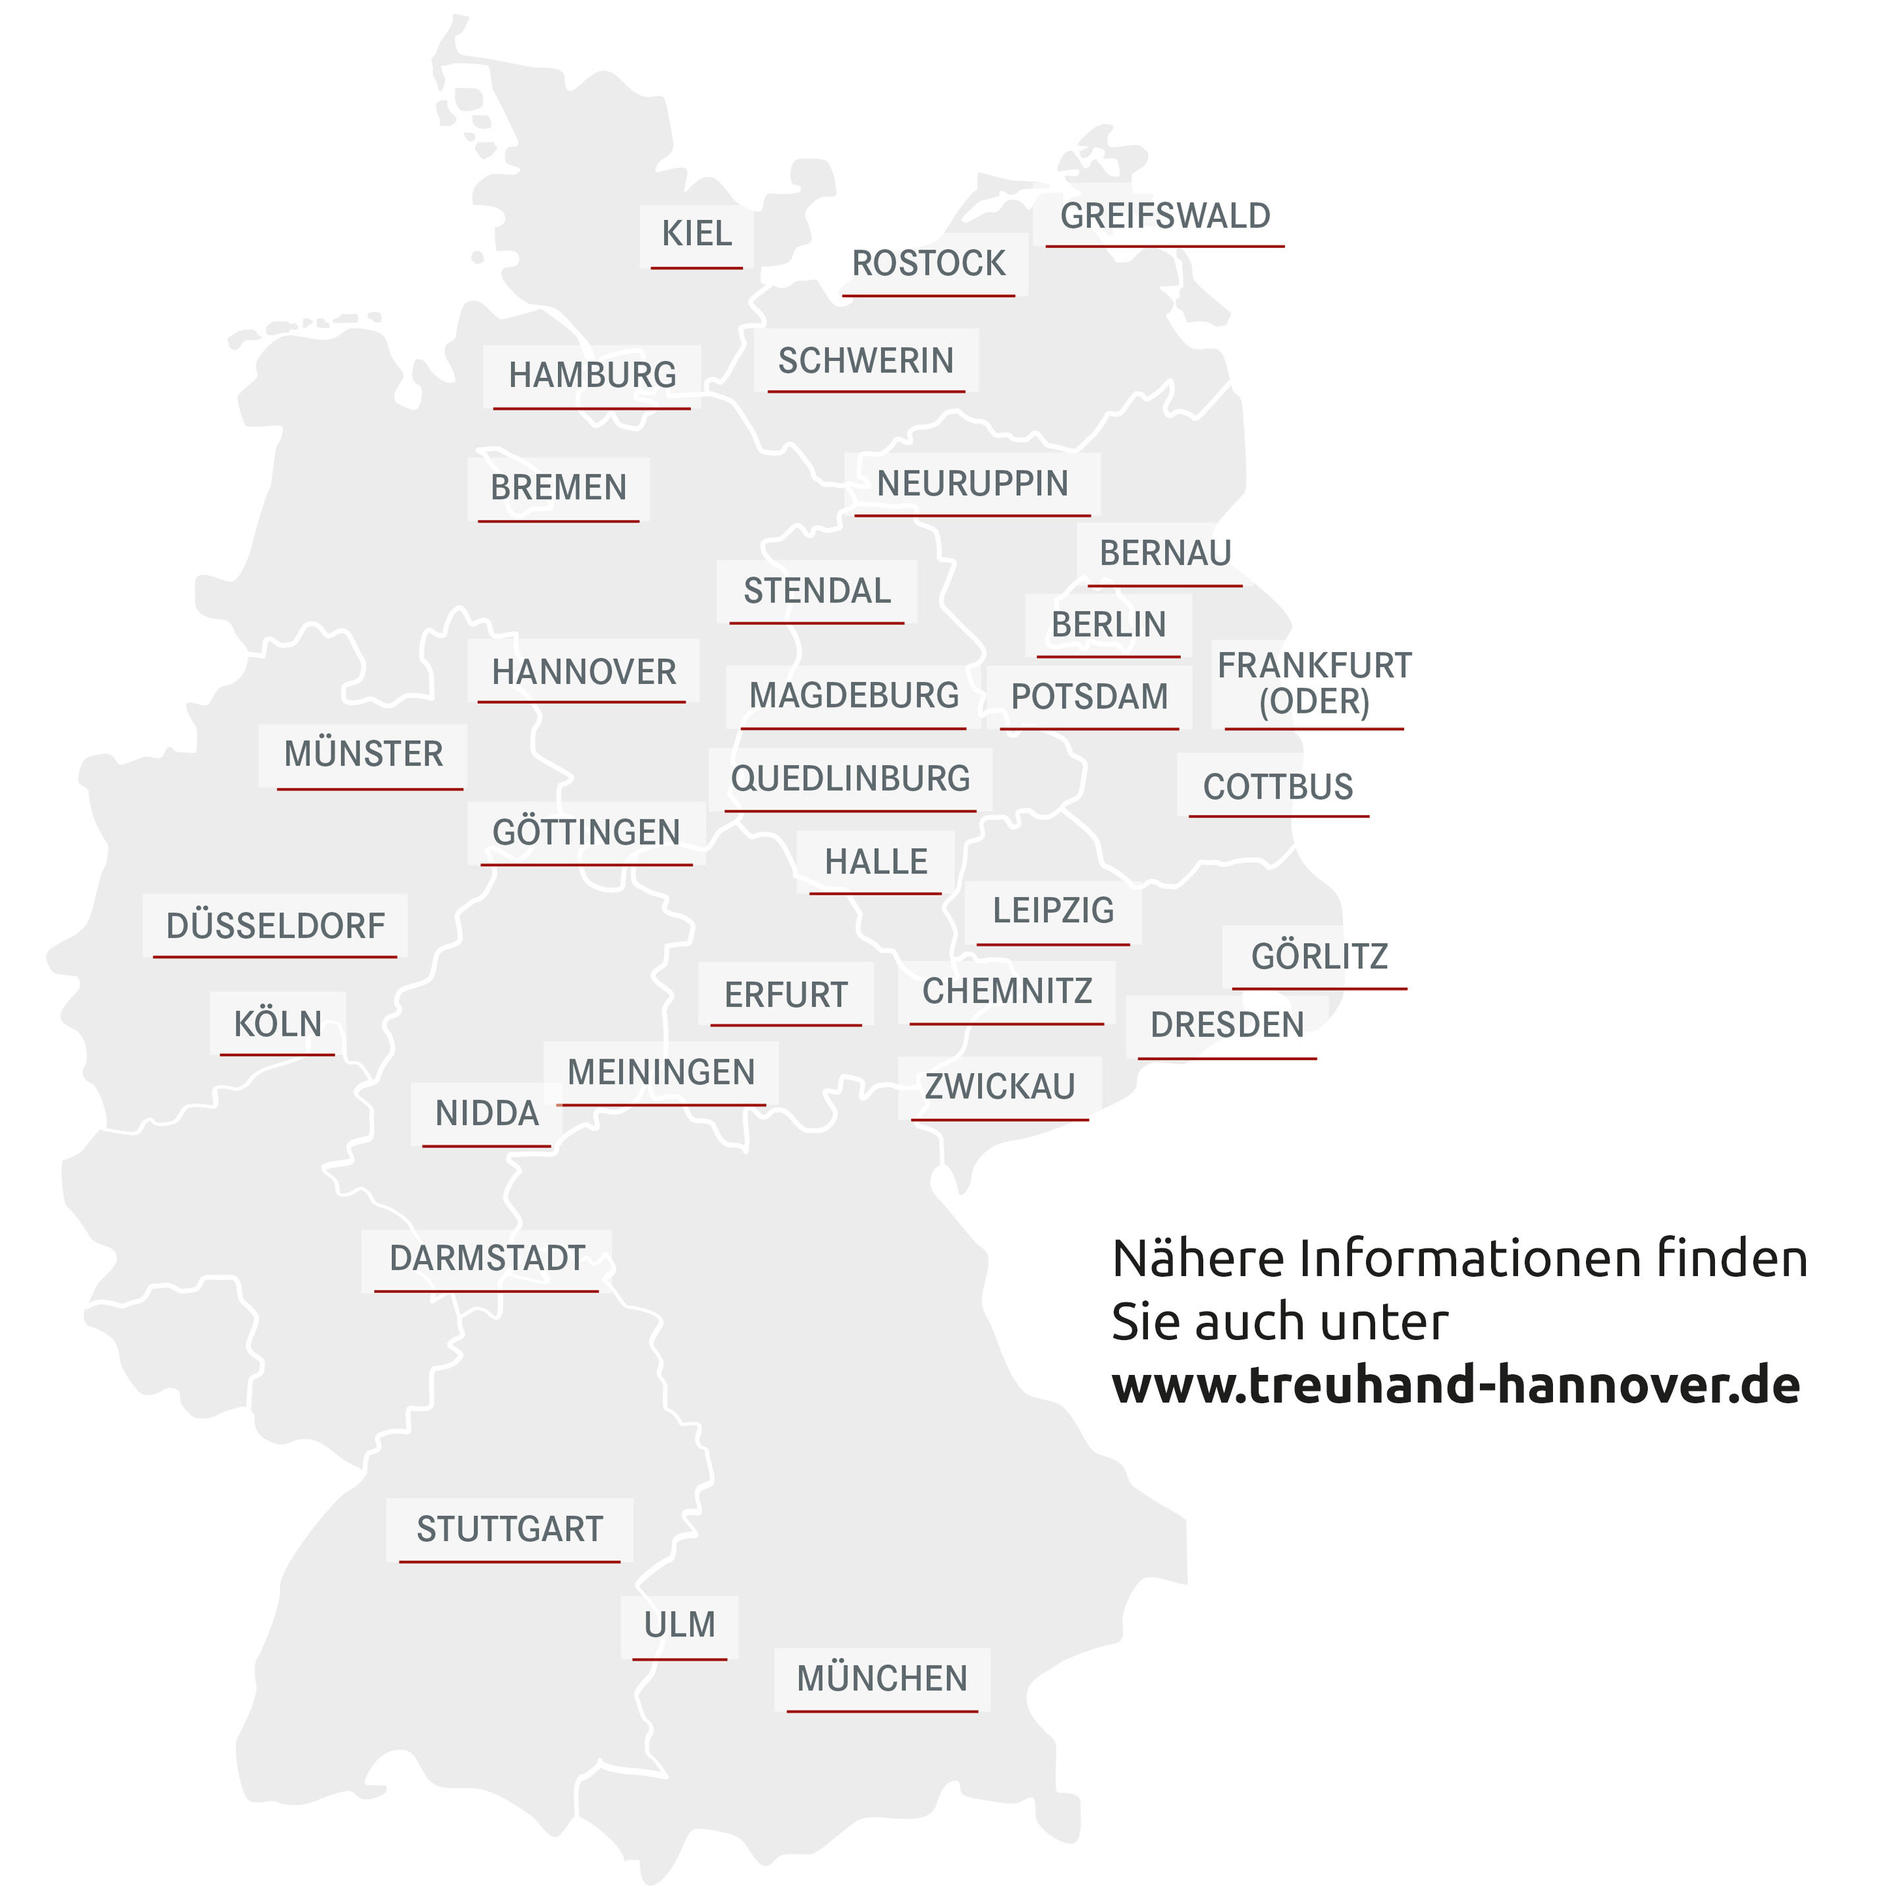 Kundenbild groß 1 Treuhand Hannover GmbH Steuerberatungsgesellschaft Niederlassung Greifswald